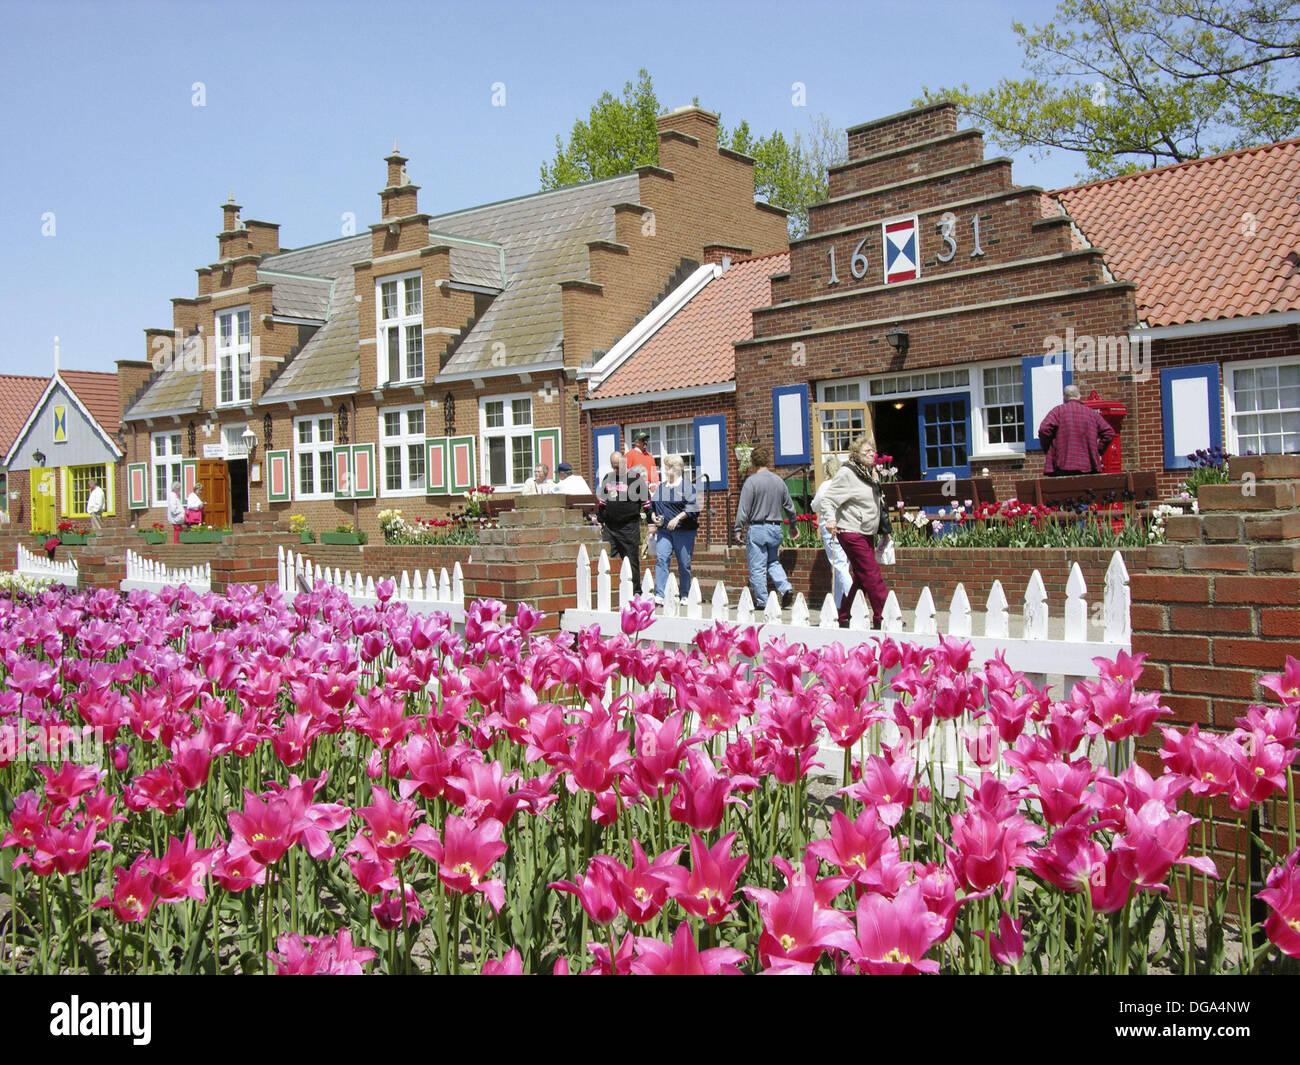 Holland Michigan USA Tulip Festival Tulip Flowers And Shops On - Holland tulip festival